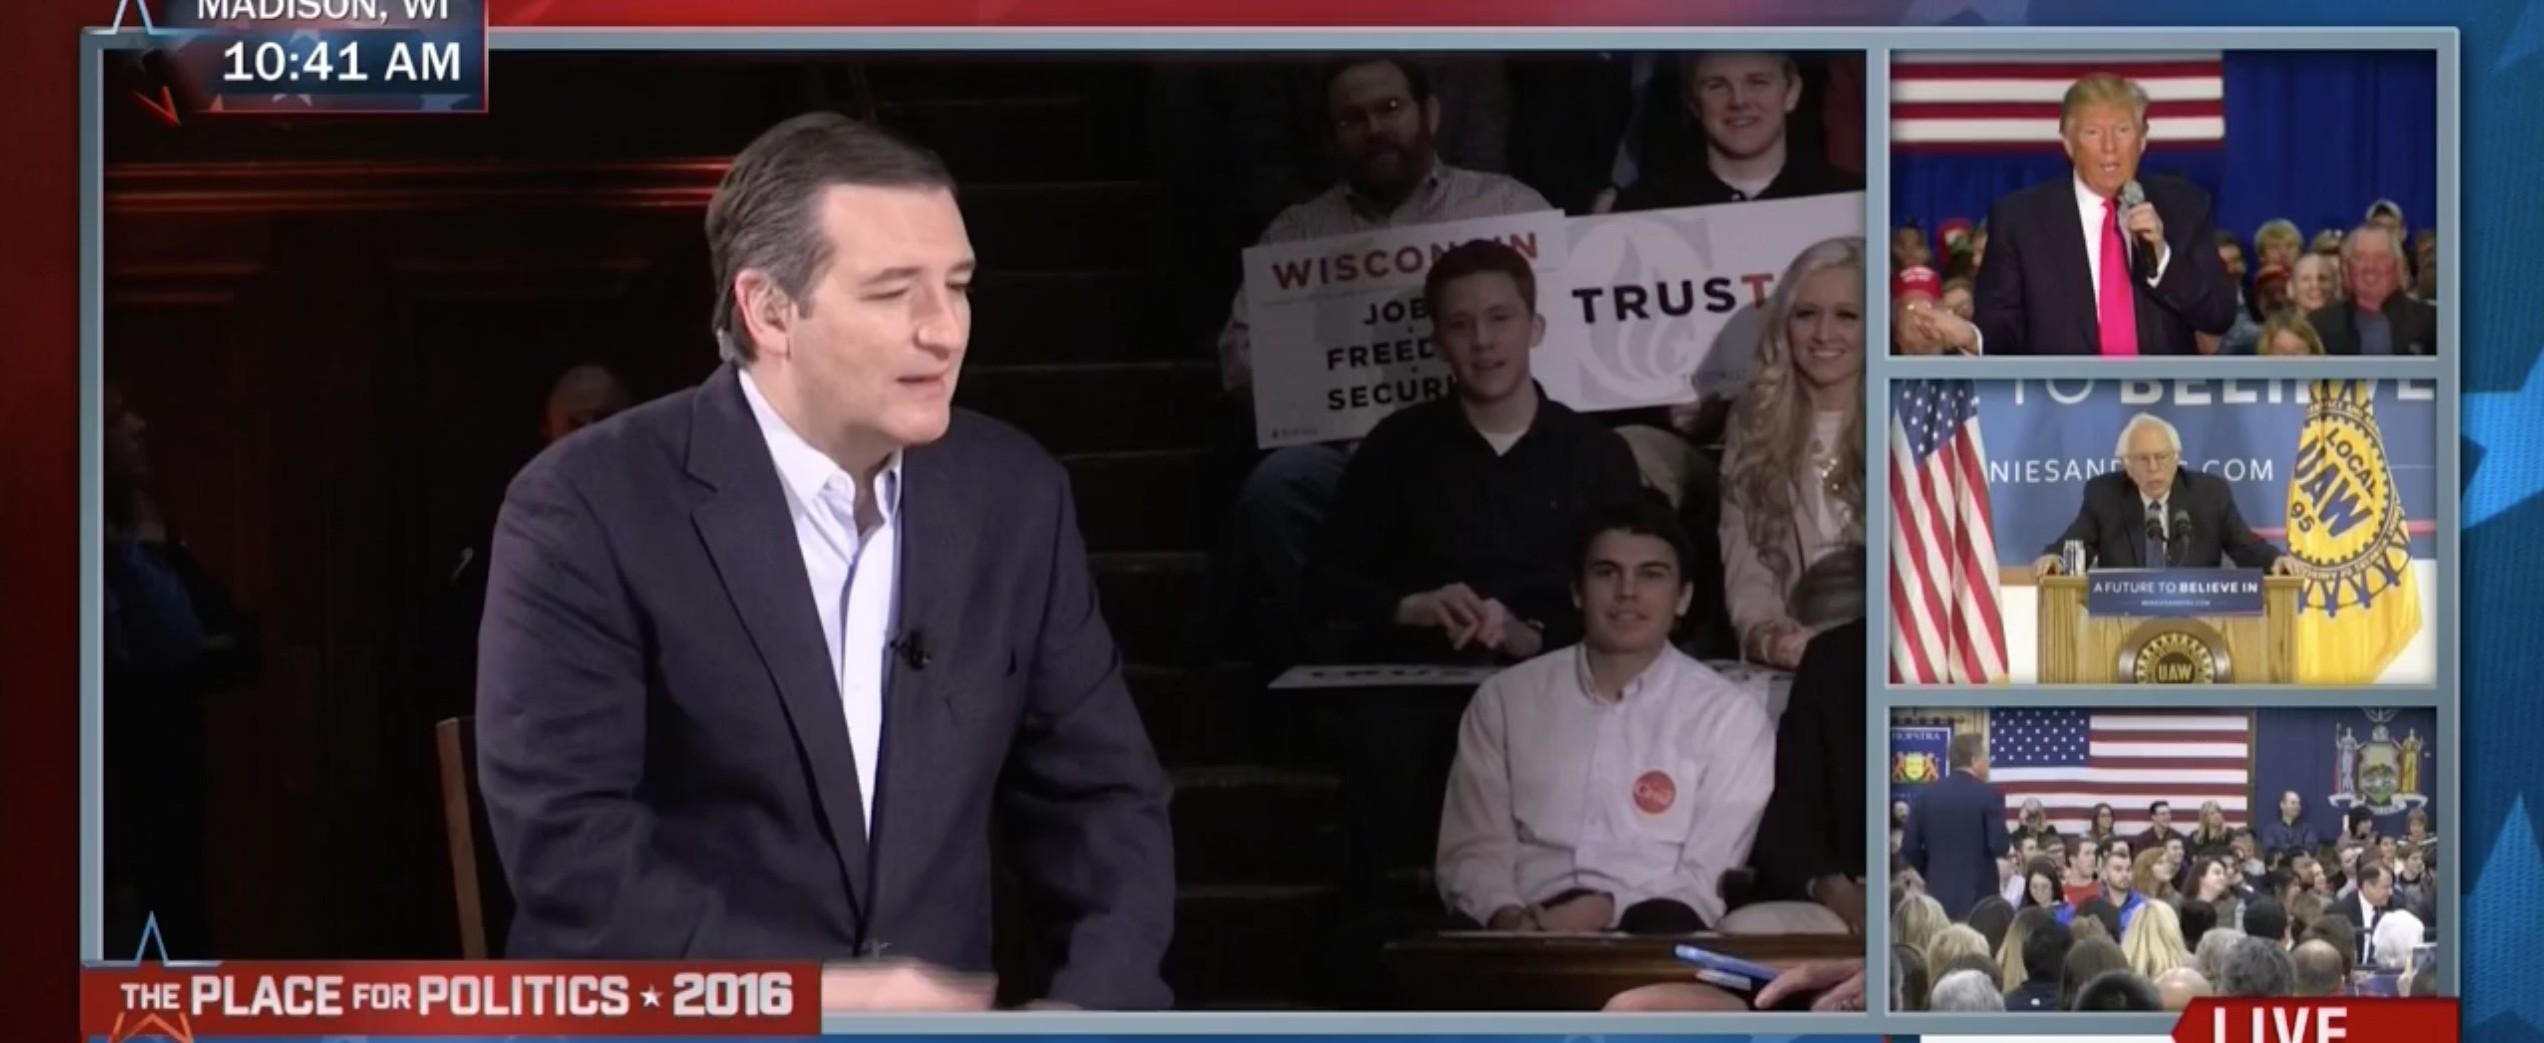 Ted Cruz, Screen Shot MSNBC, 4-4-2016